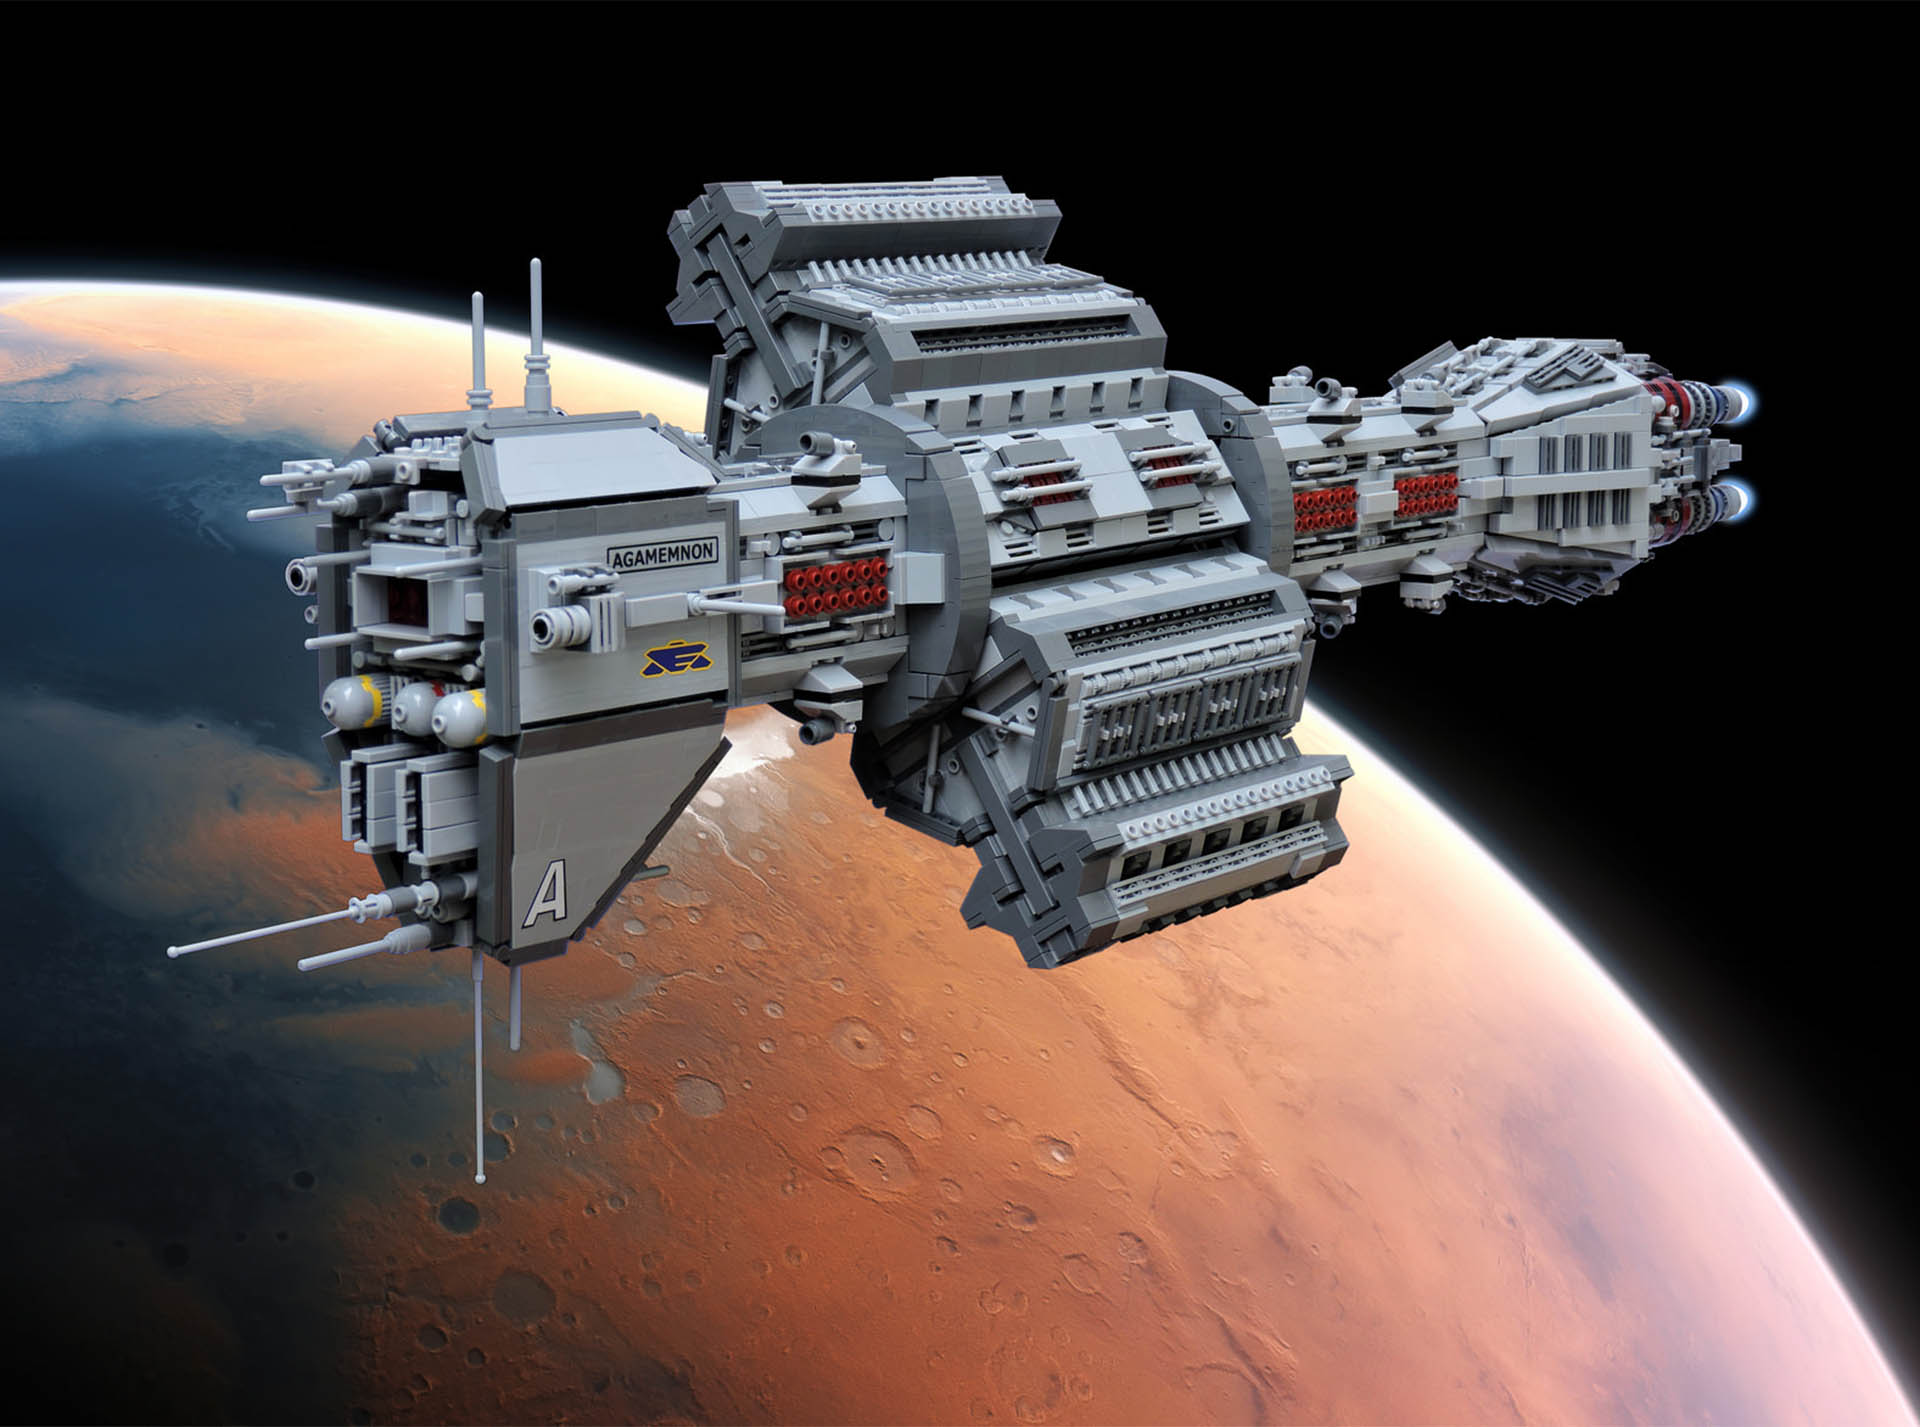 Babylon 5 EAS Agamemnon Recreated In LEGO